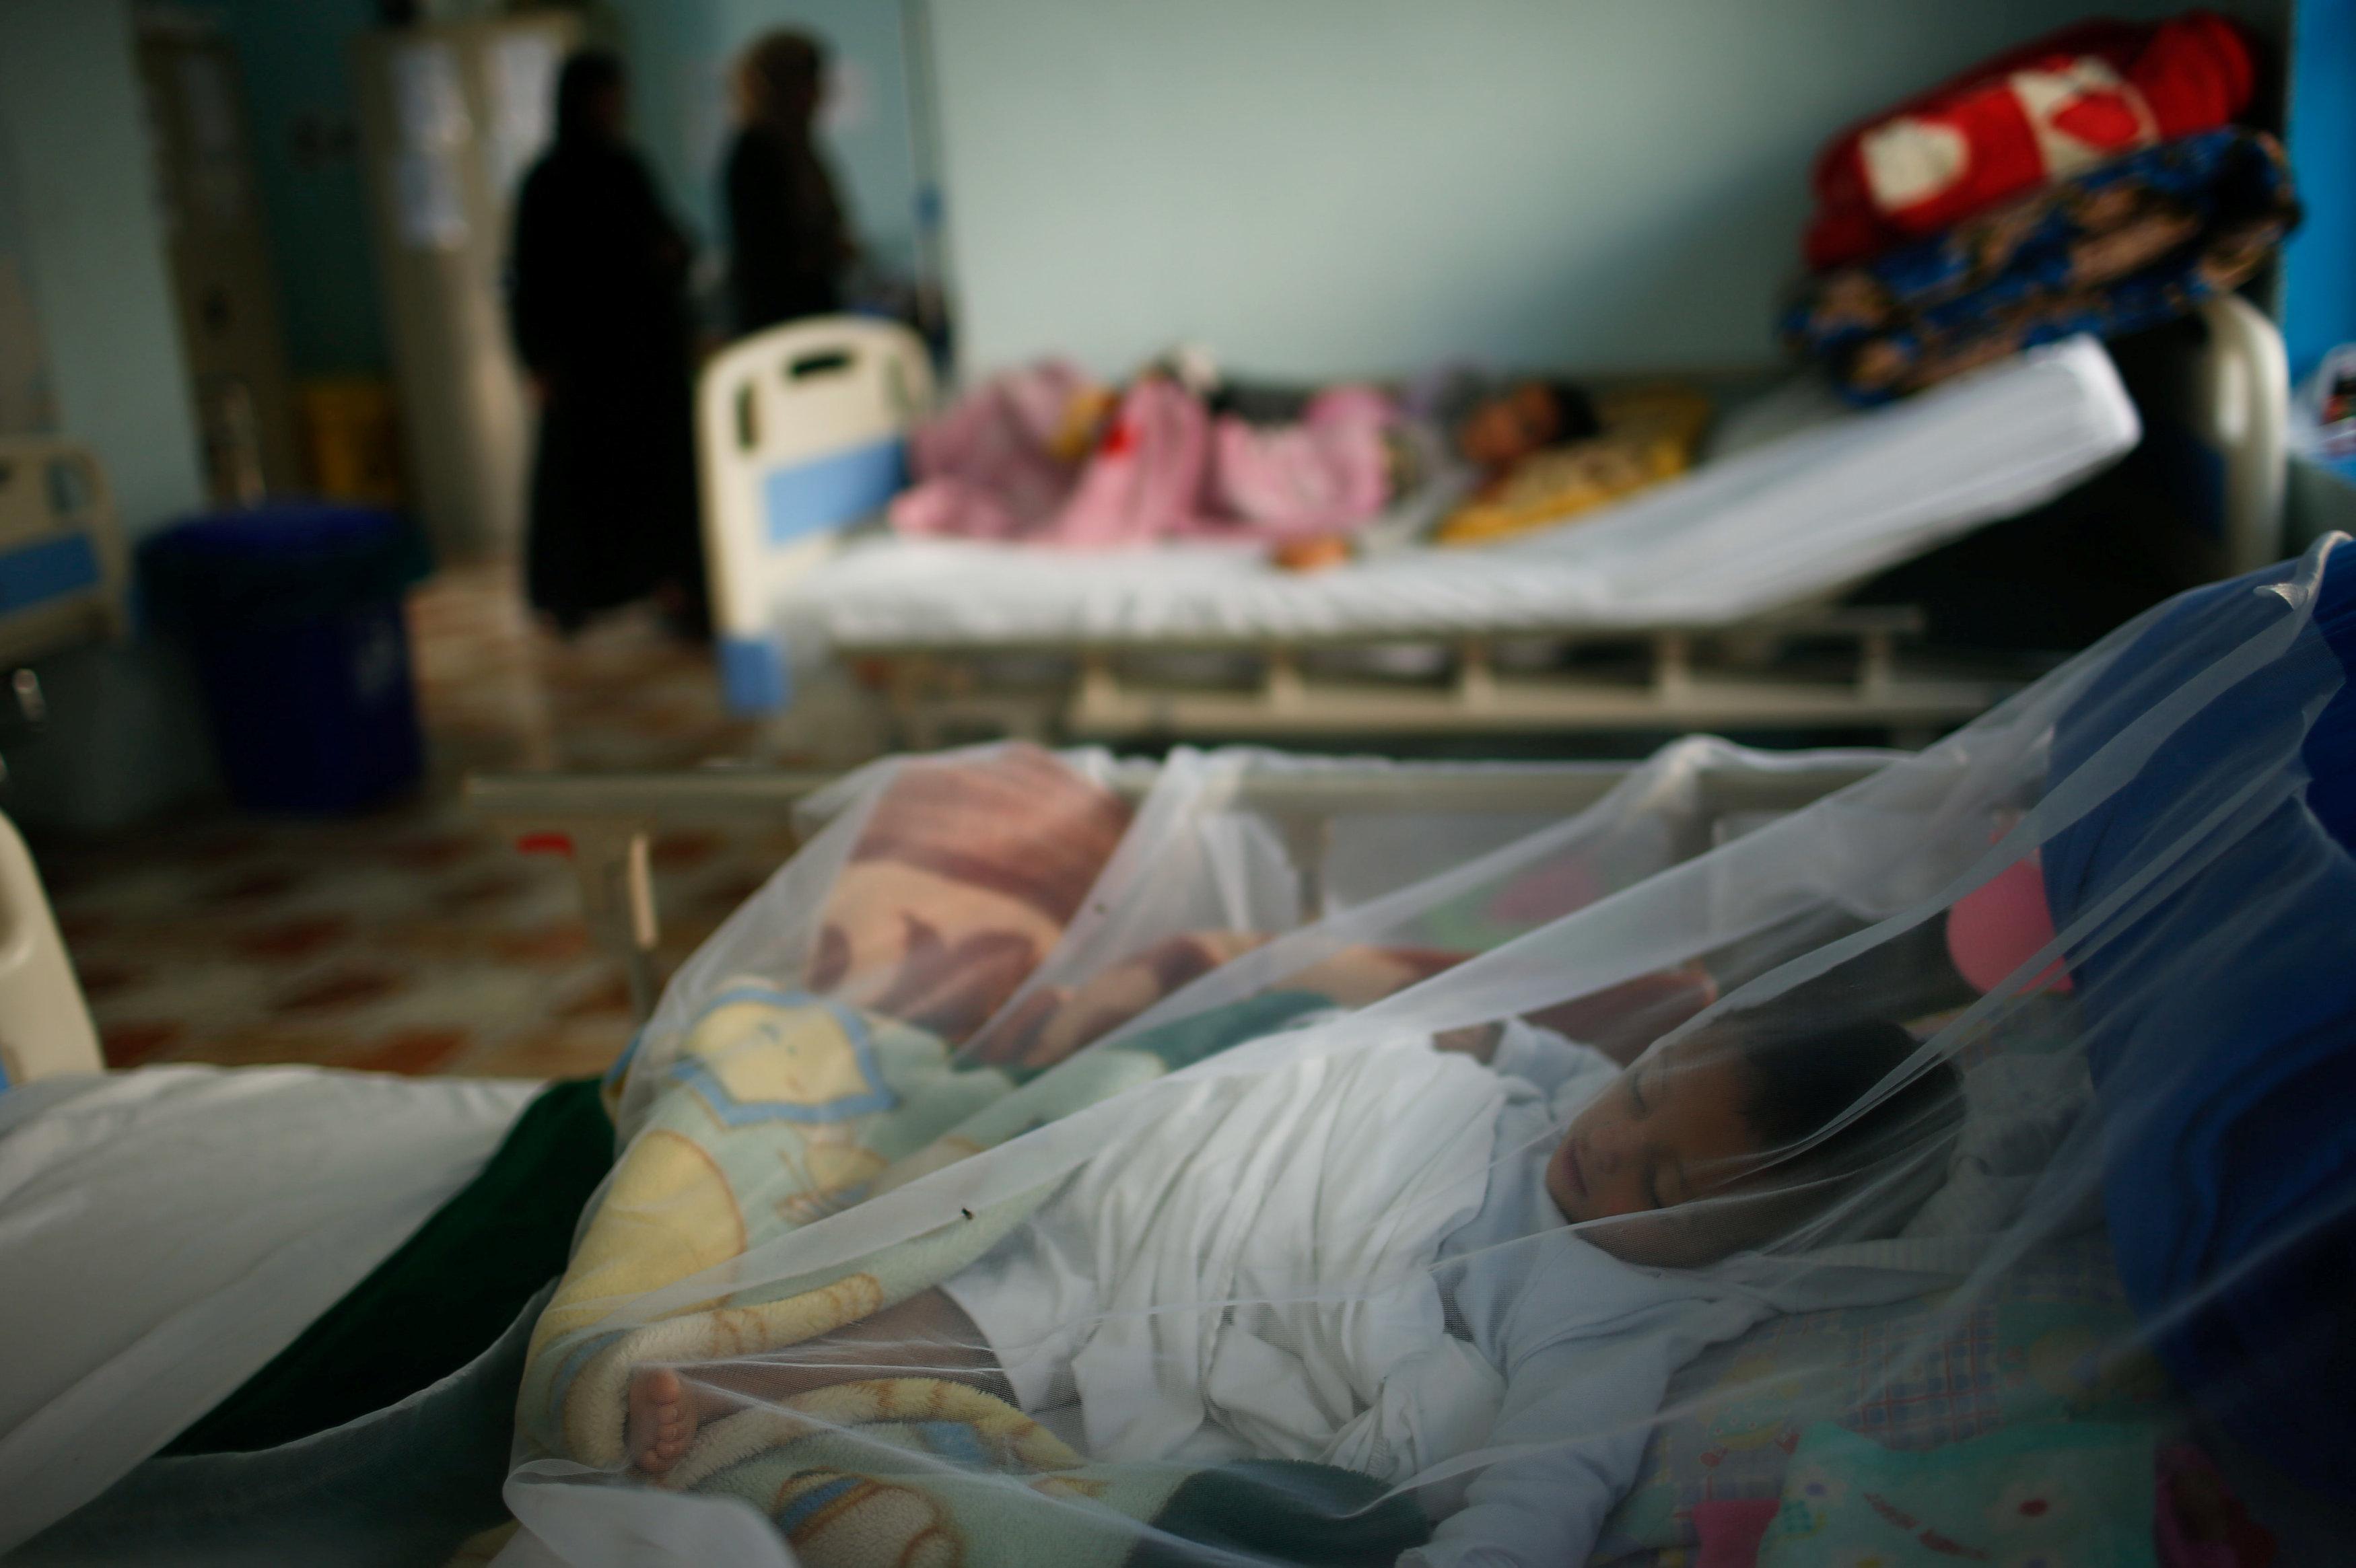 Patients Iraqi children lie at a hospital run by Medecins Sans Frontieres in Qayyara, Iraq April 6, 2017. Picture taken April 6, 2016. REUTERS/Suhaib Salem